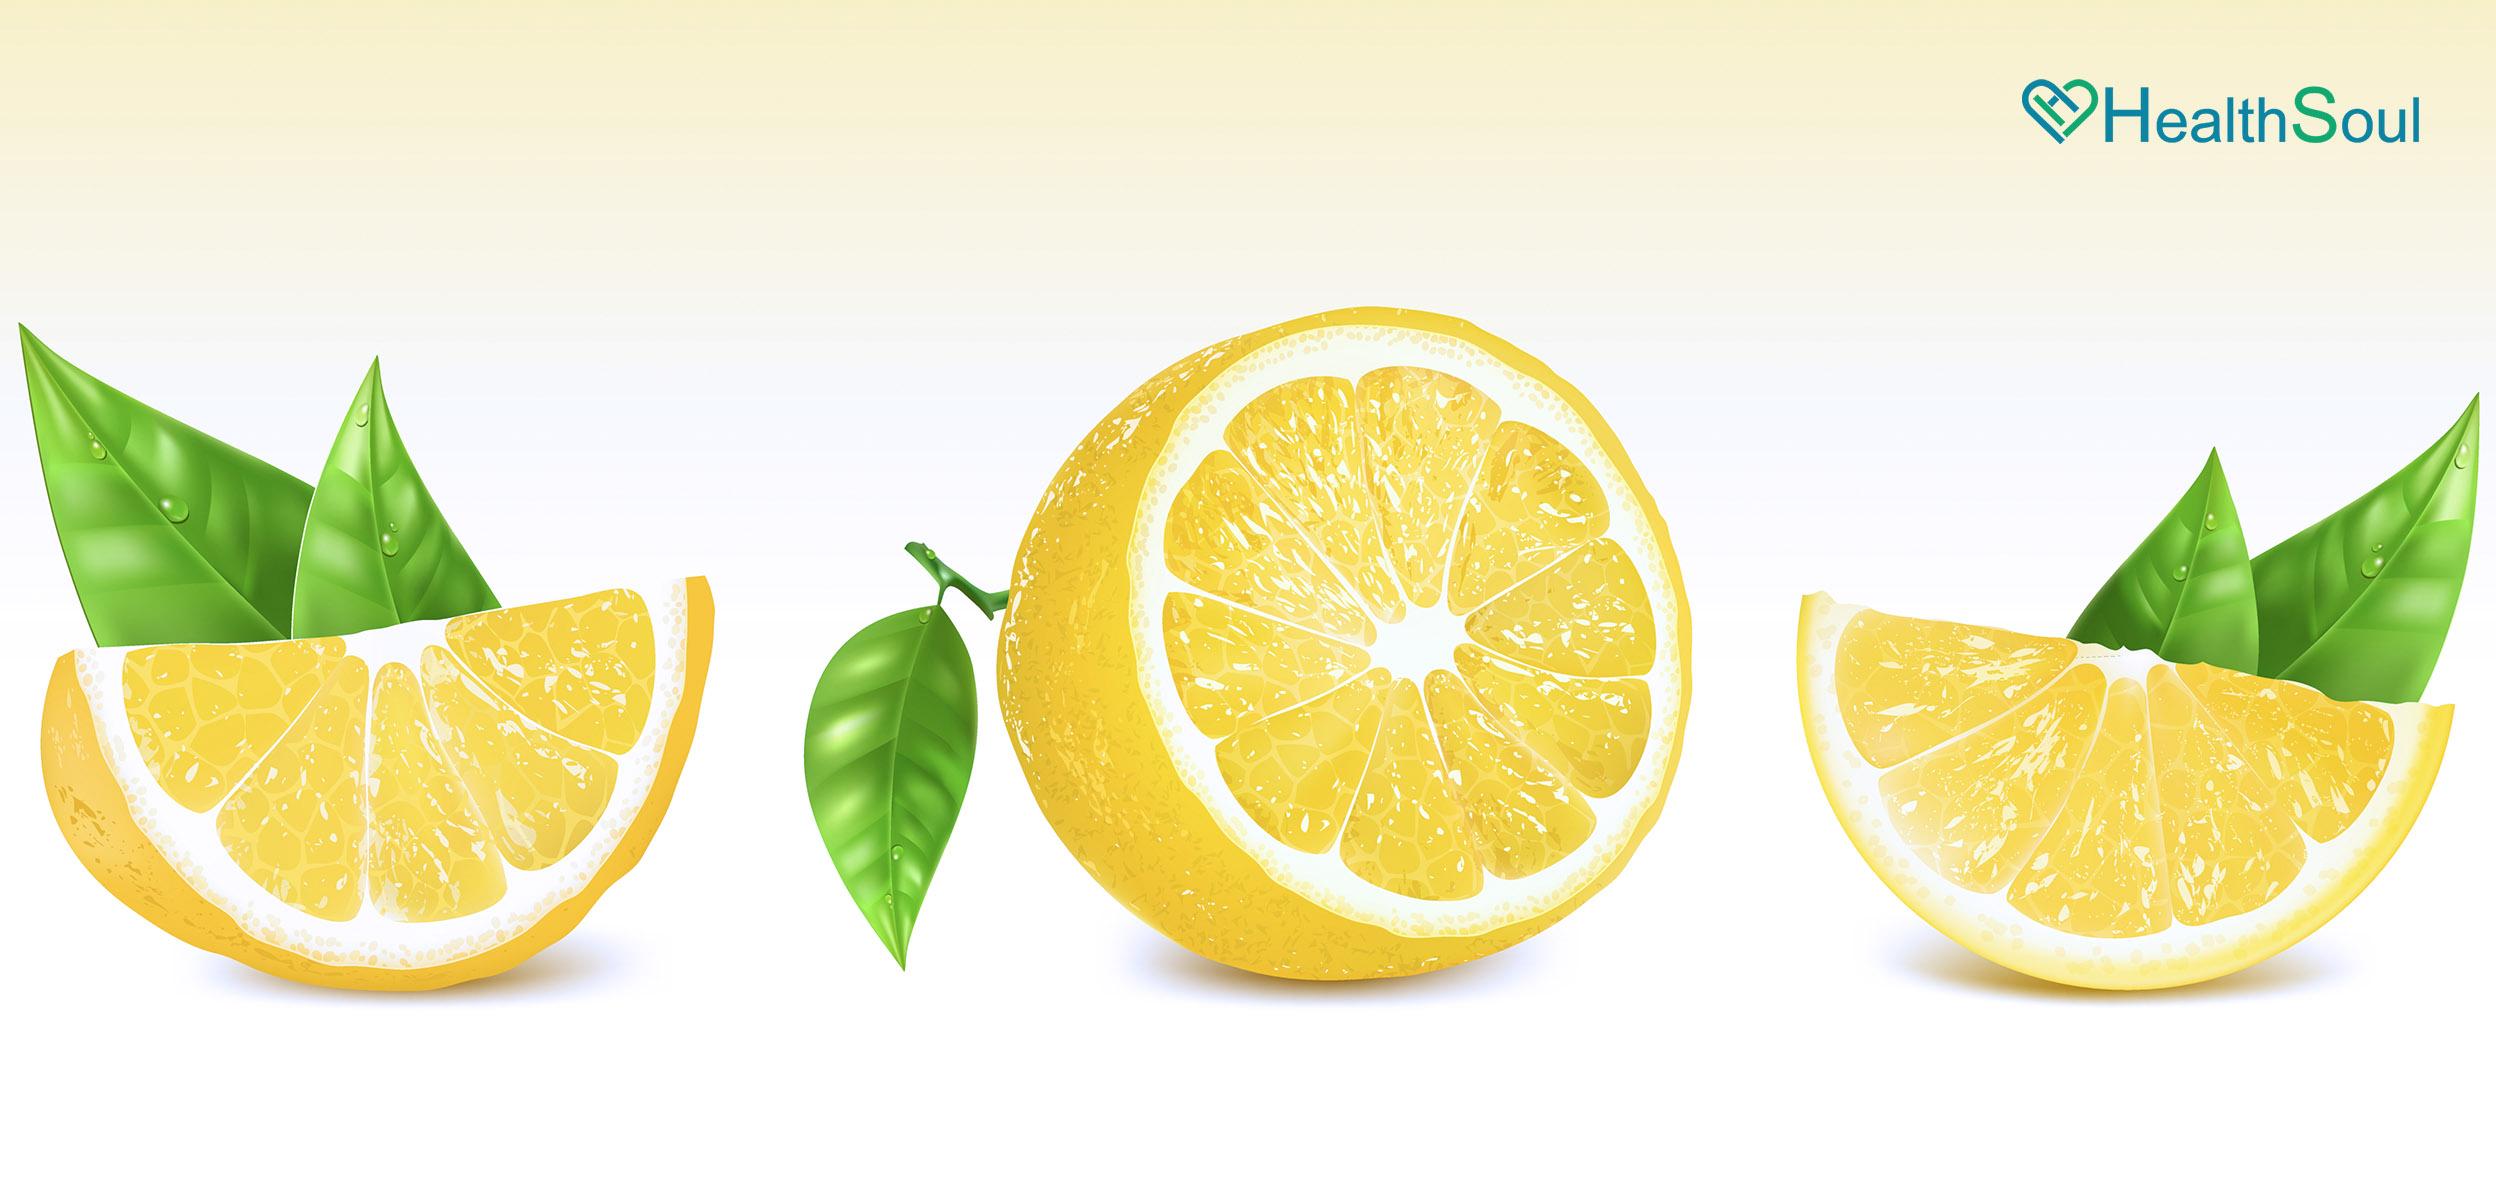 Health benefits of lemons | HealthSoul